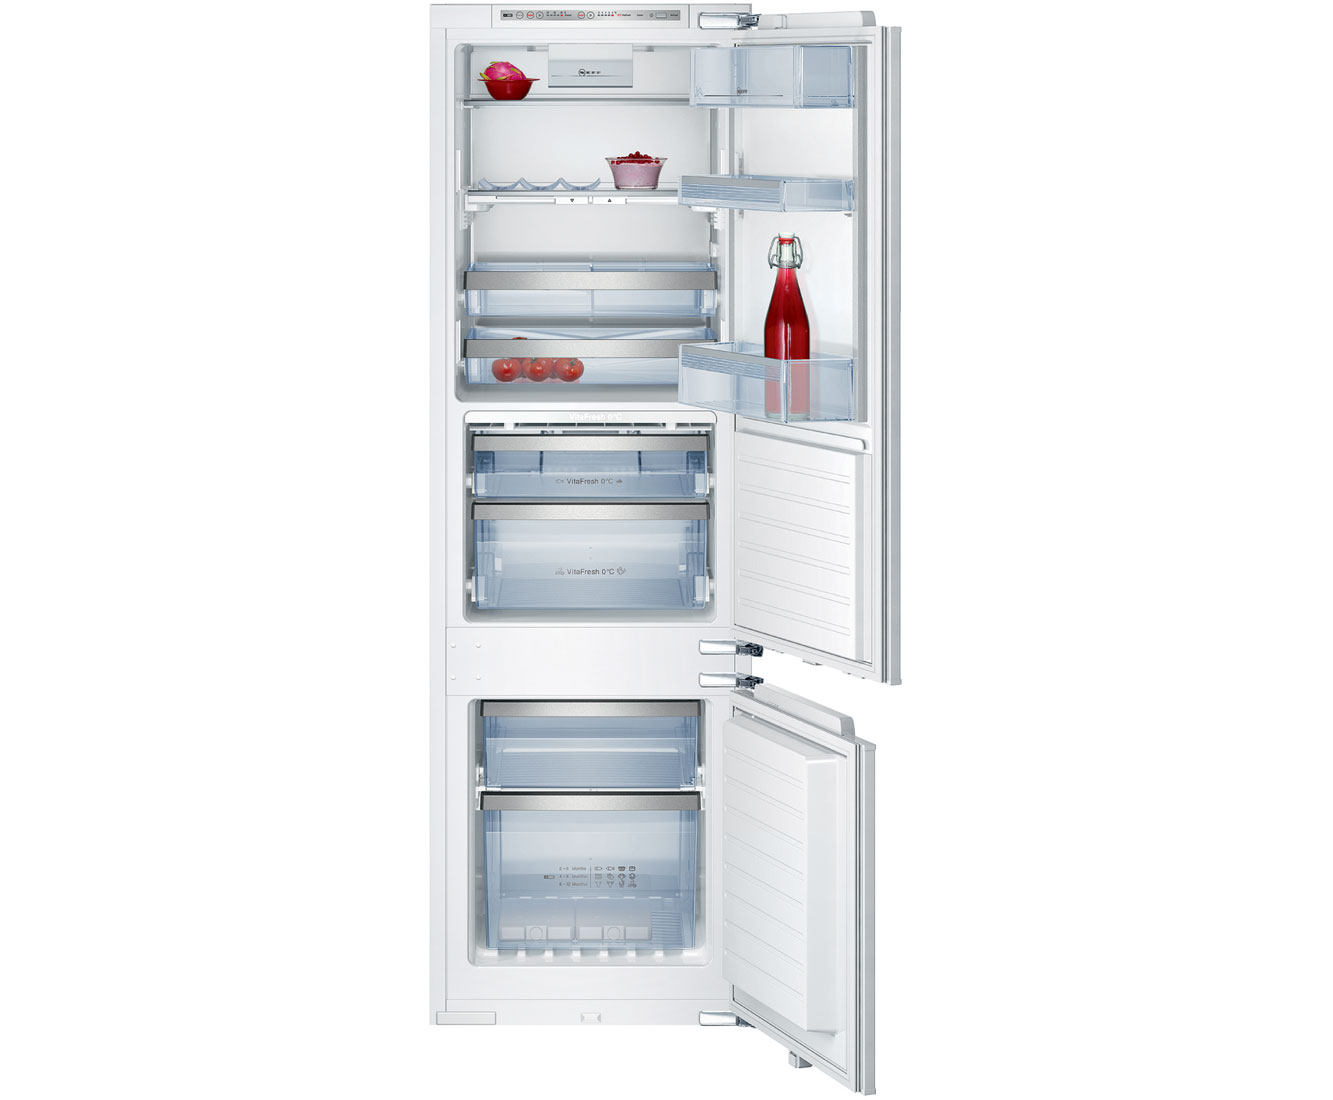 Neff K8345X0 Integrated Fridge Freezer Frost Free in White